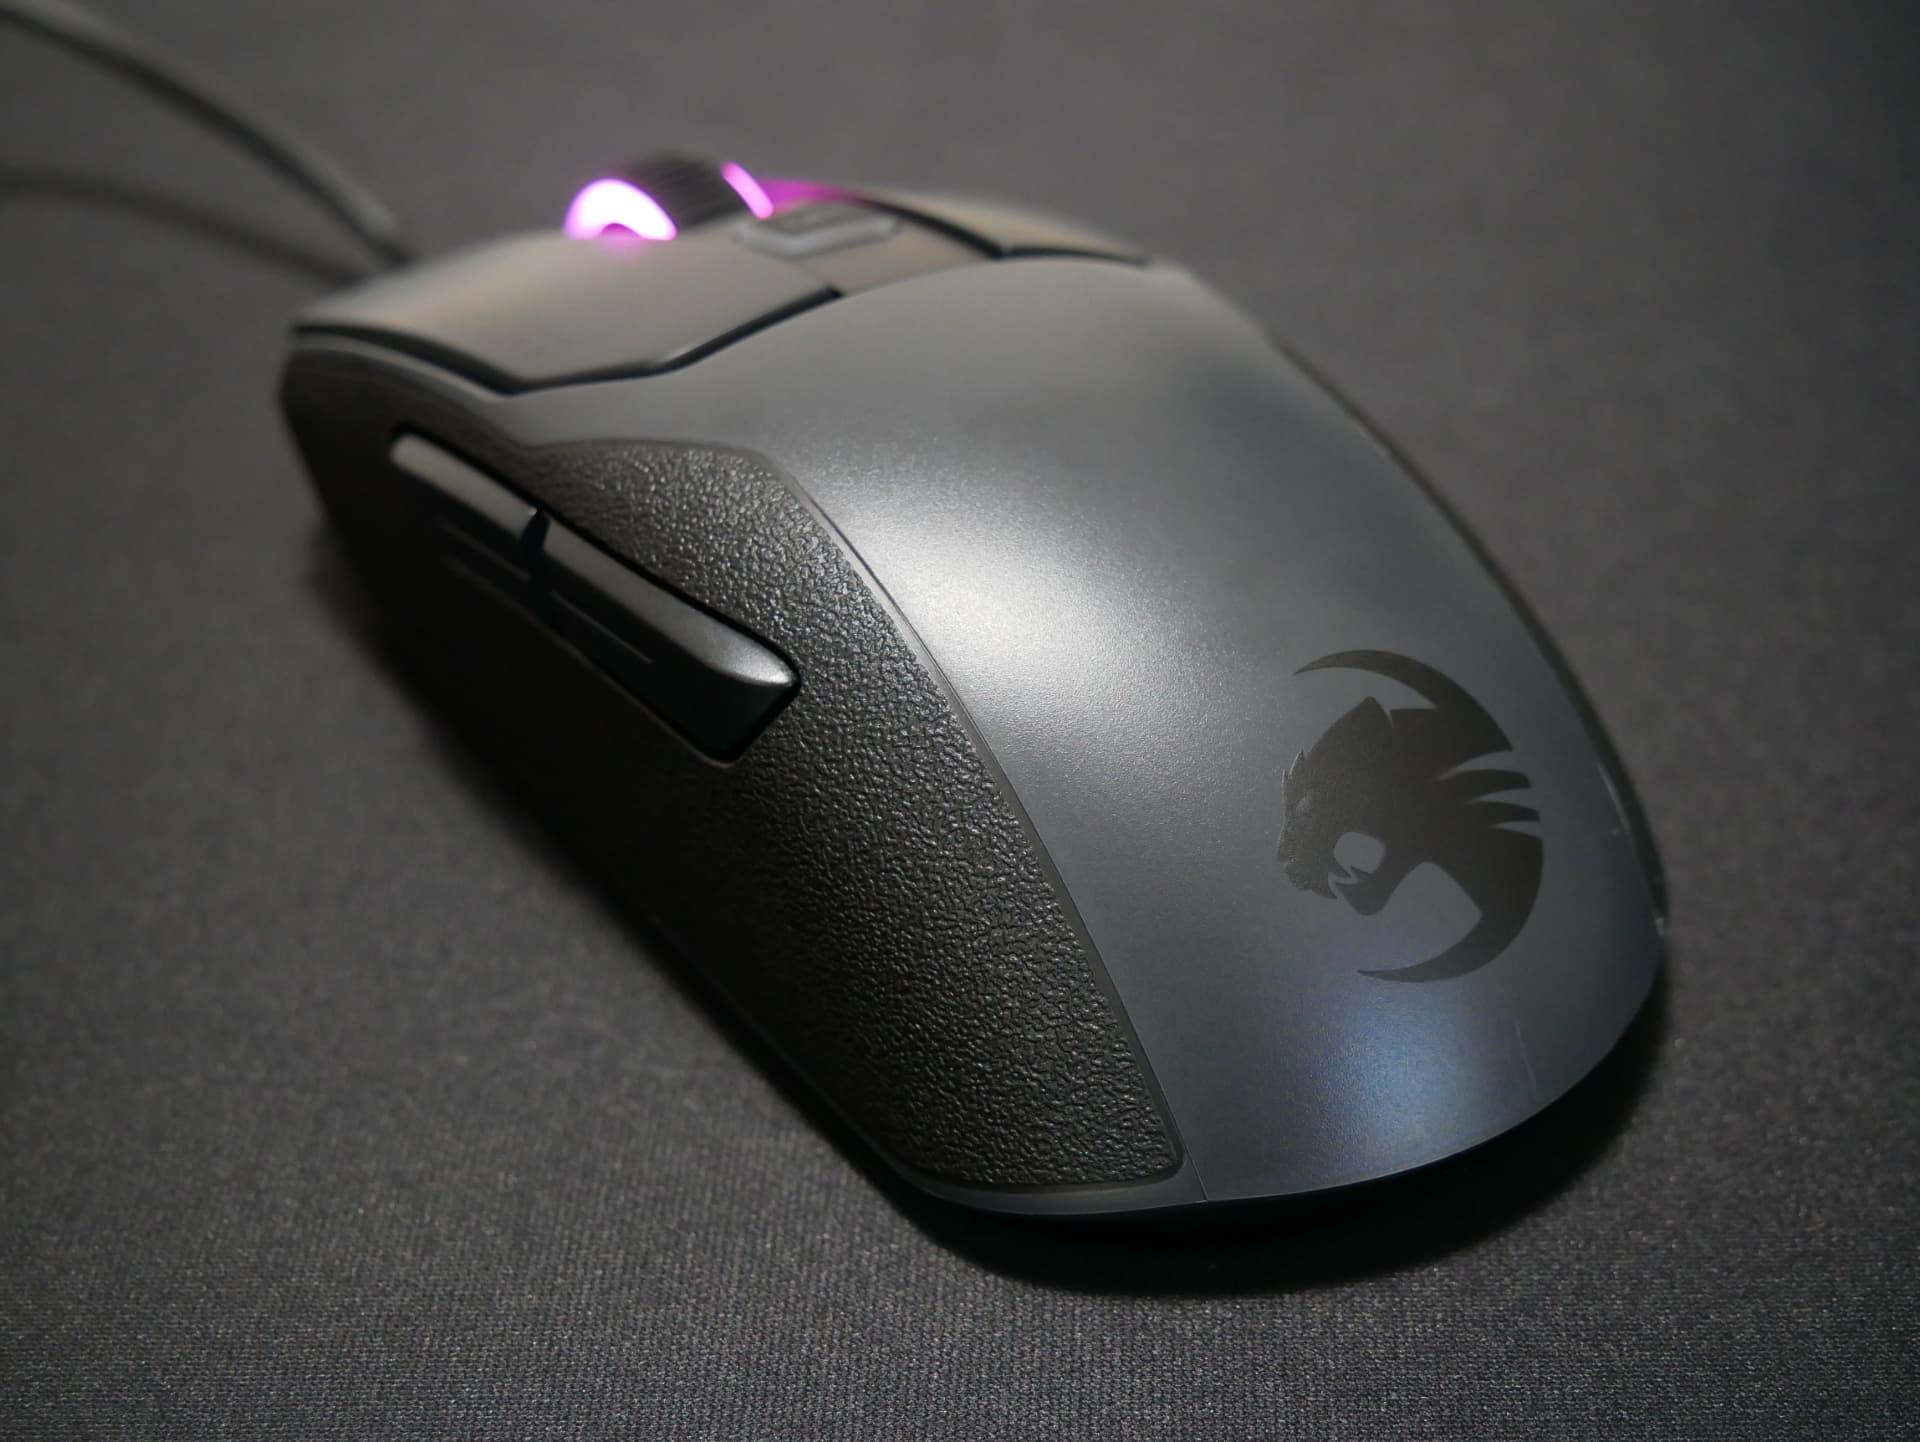 「ROCCAT Kain 100/102 AIMO」レビュー。上位モデルに引けを取らないクオリティのゲーミングマウス